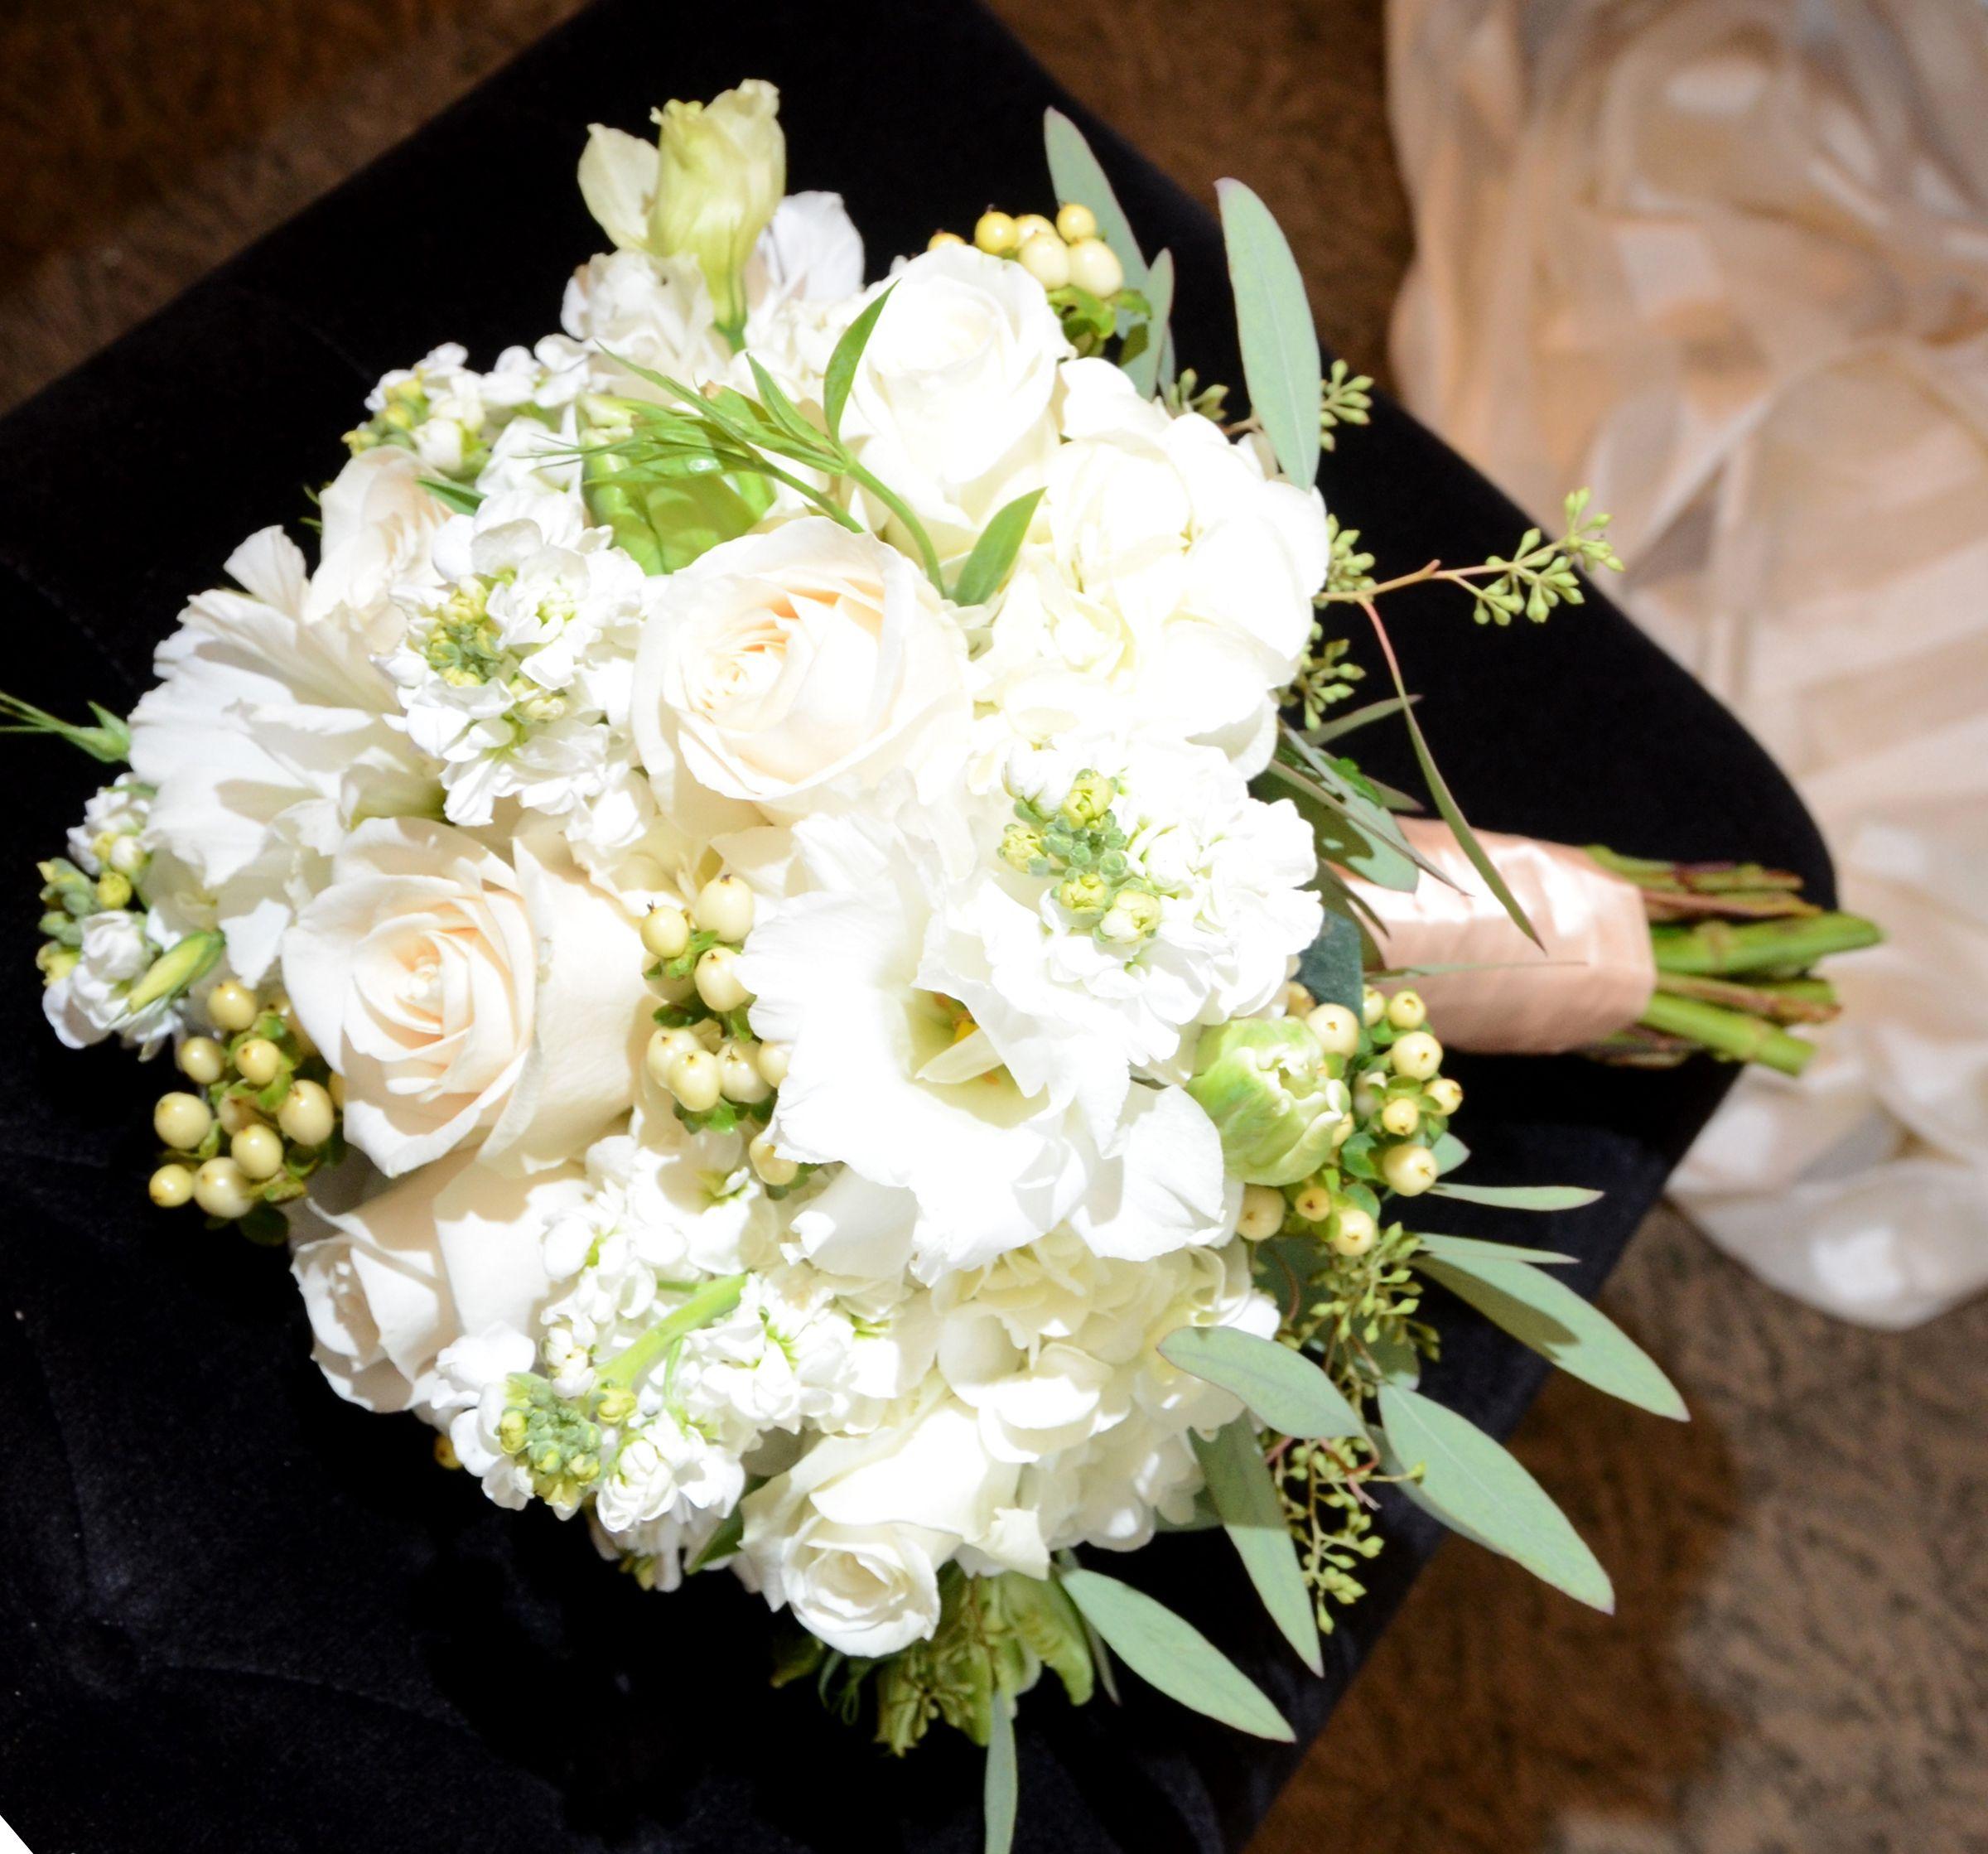 White Rose Weddings Celebrations Events Daytime To: White Roses, Vandella Rose, White Lizzianthus, Seeded Euc